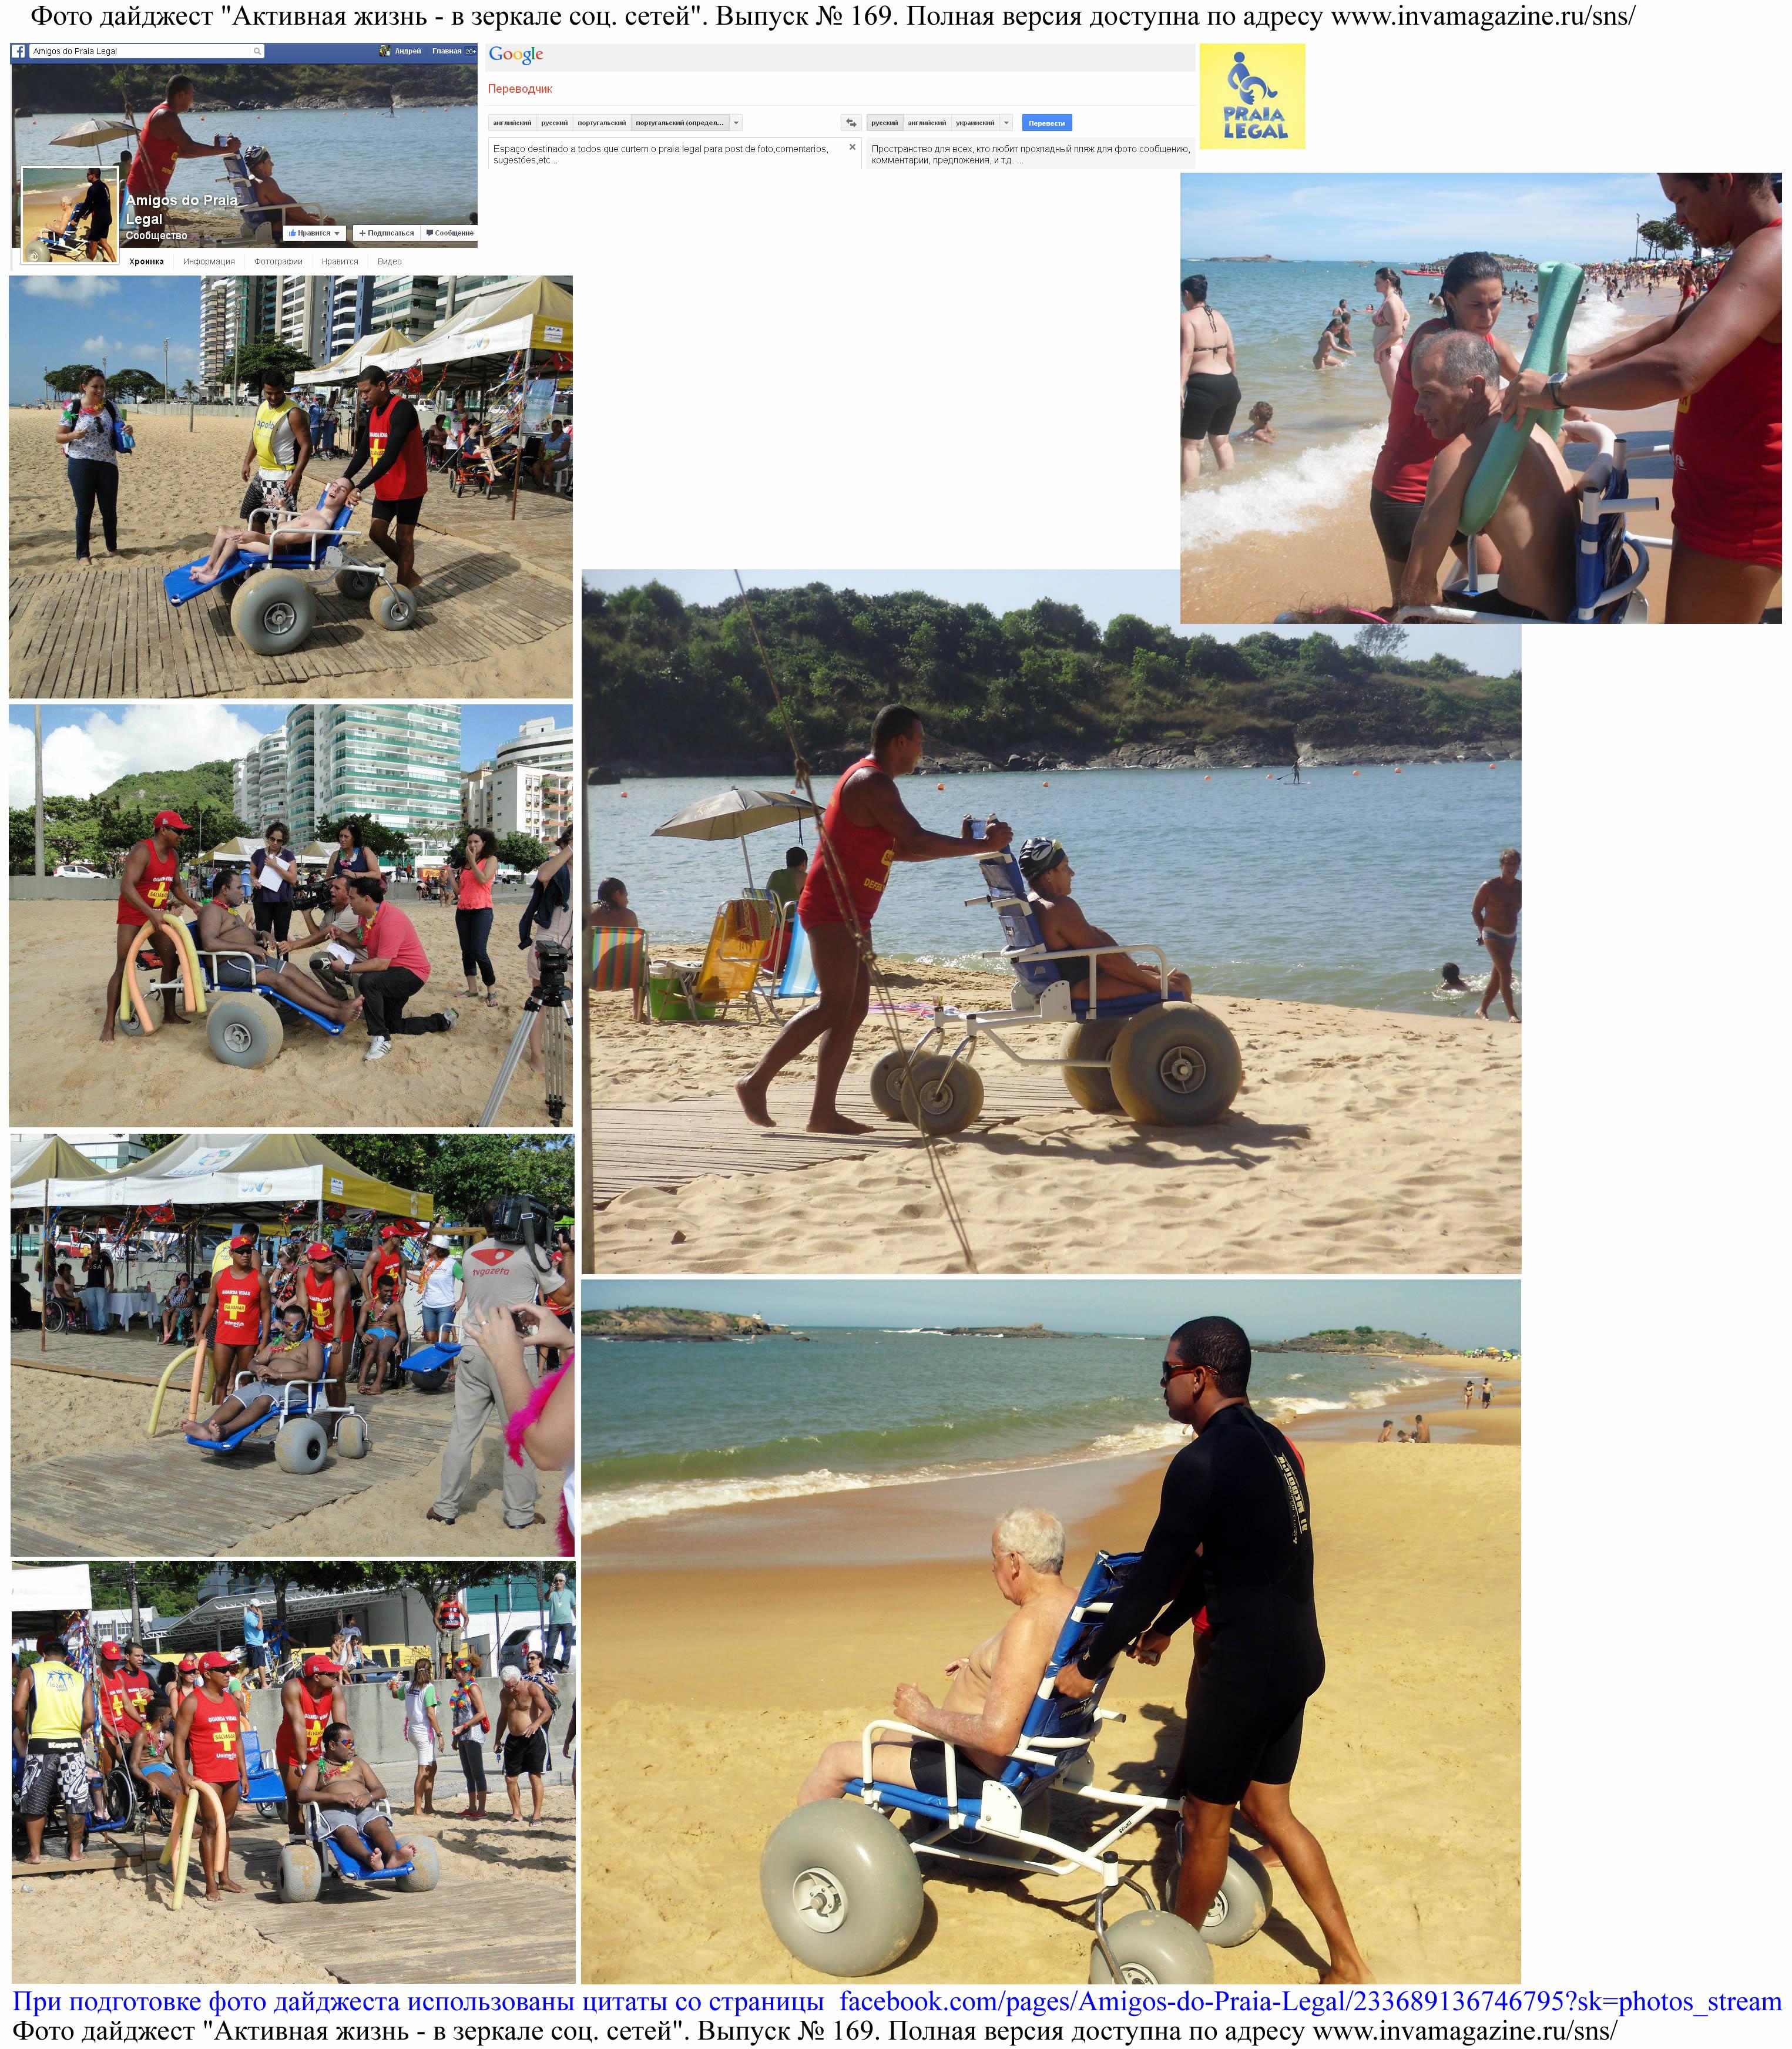 Фото дайджест страницы Amigos do Praia Legal